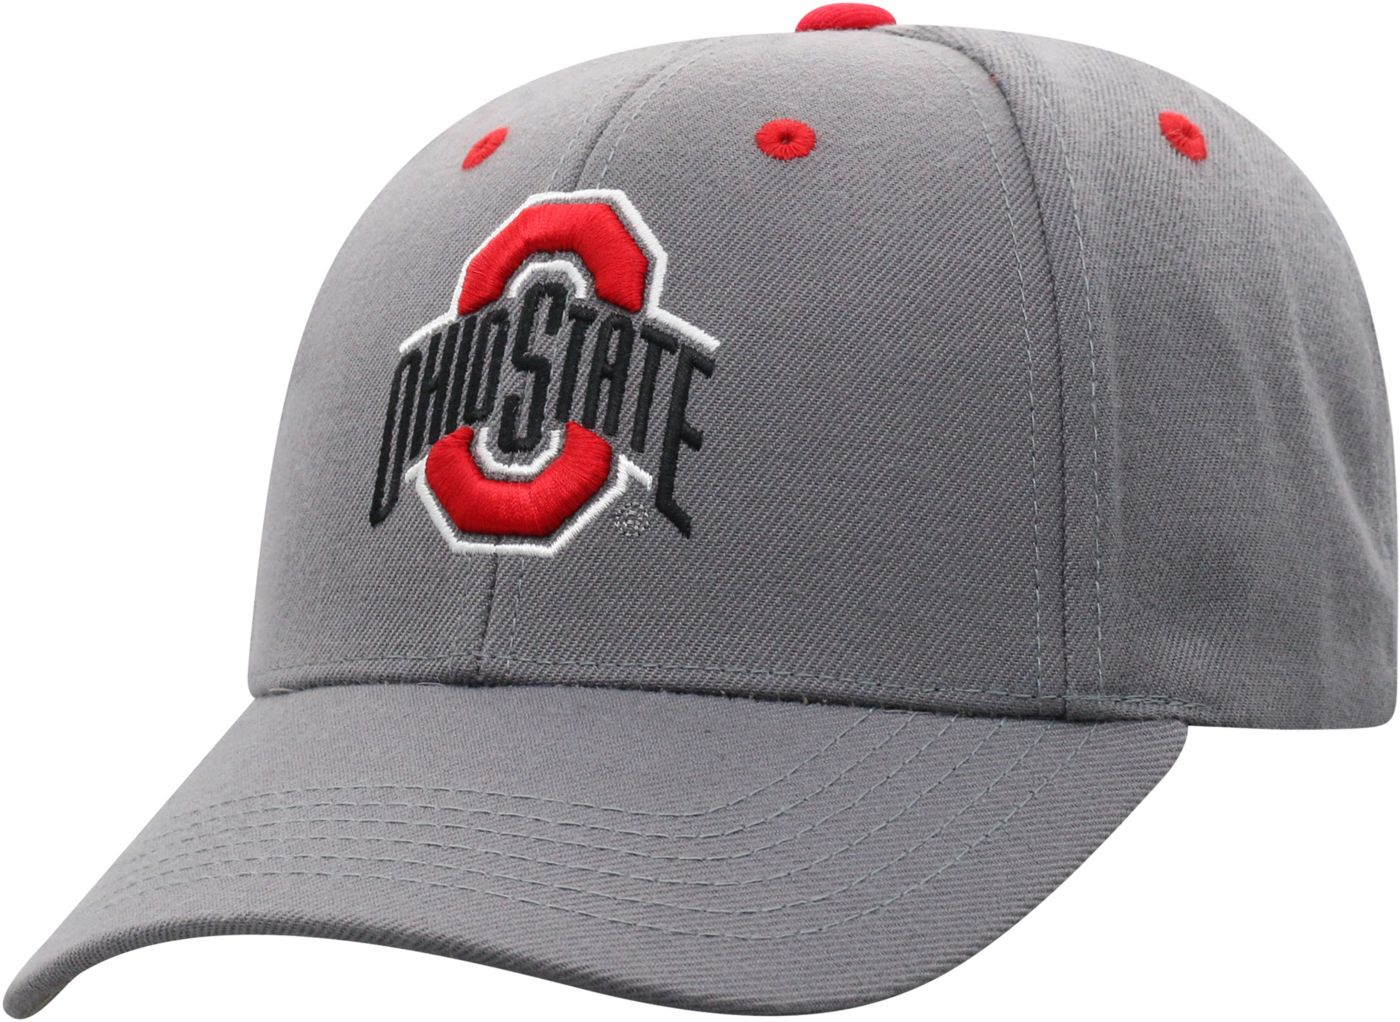 Top of the World Men's Ohio State Buckeyes Grey Triple Threat Adjustable Hat